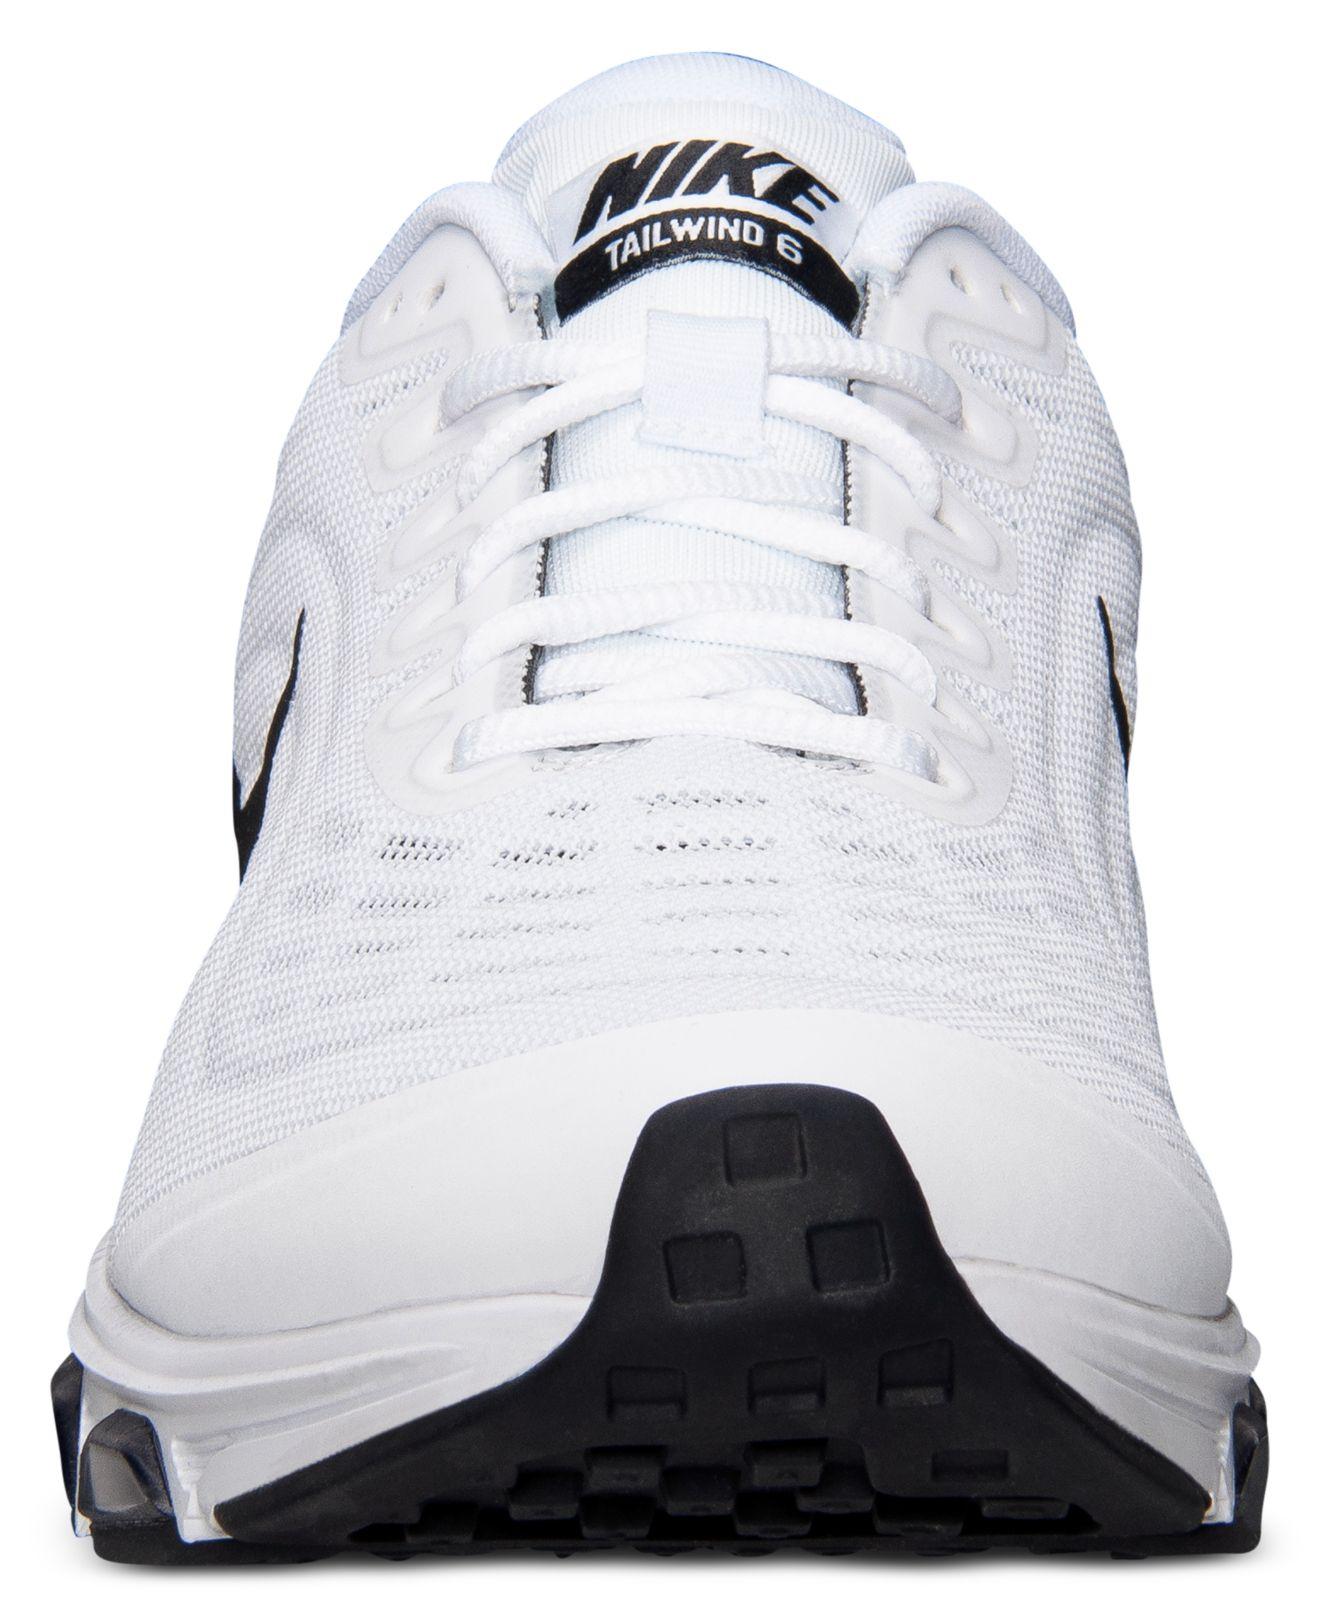 Forfremmelse Nike Air Max 97 Menn Vapormax X Kpu Tpu Svart